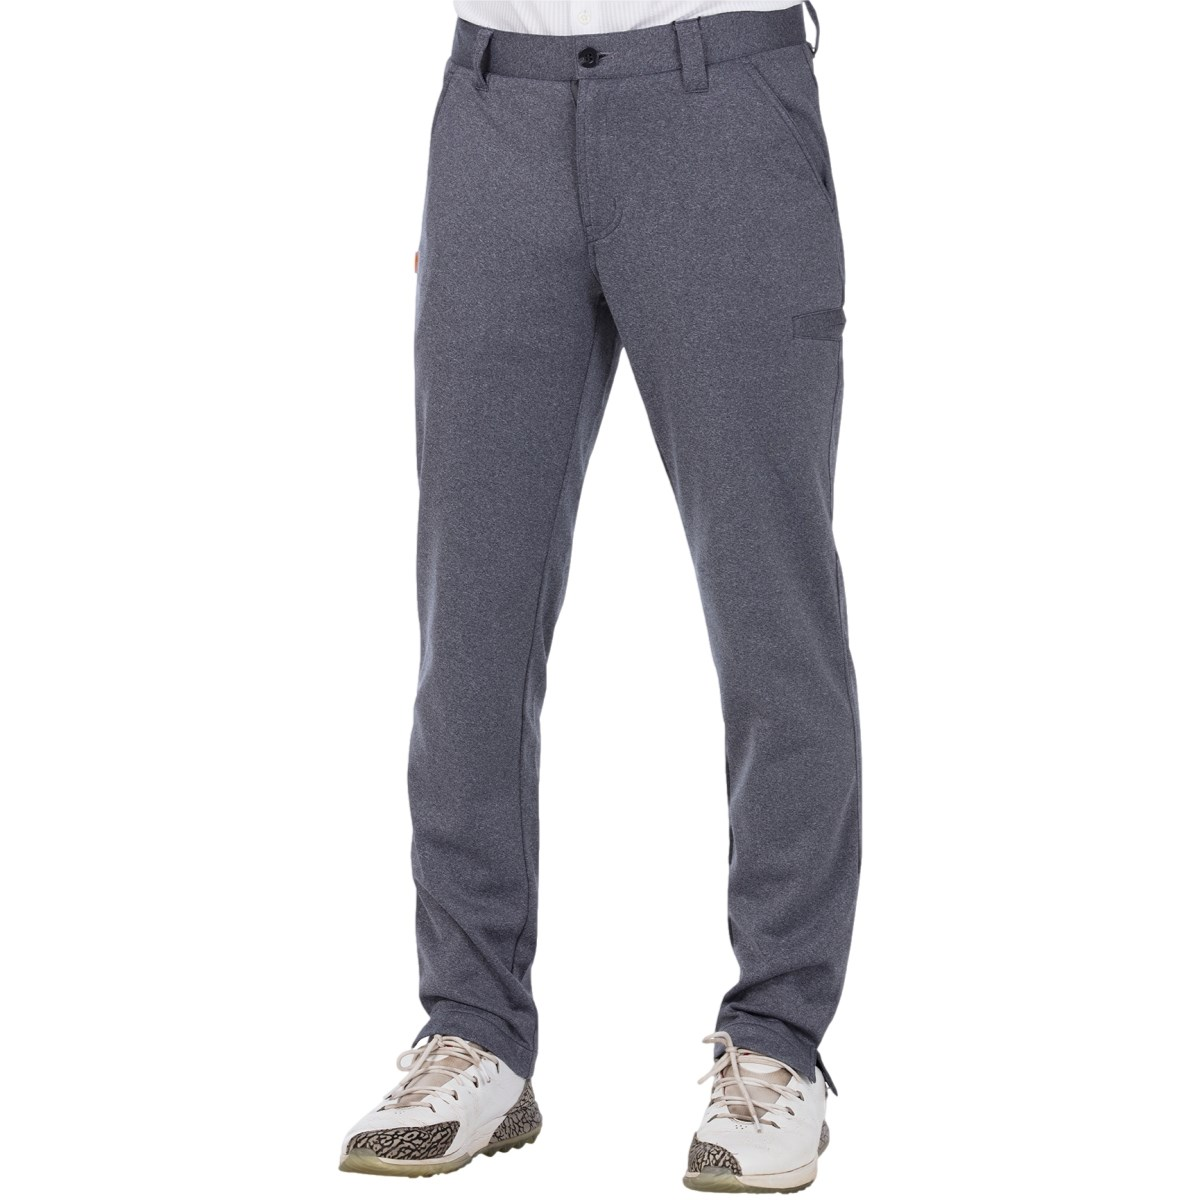 GDO オリジナル GDO ORIGINAL 7ポケットボンディングパンツ 股下73cm 3:ウエスト目安81-83 杢ブルー